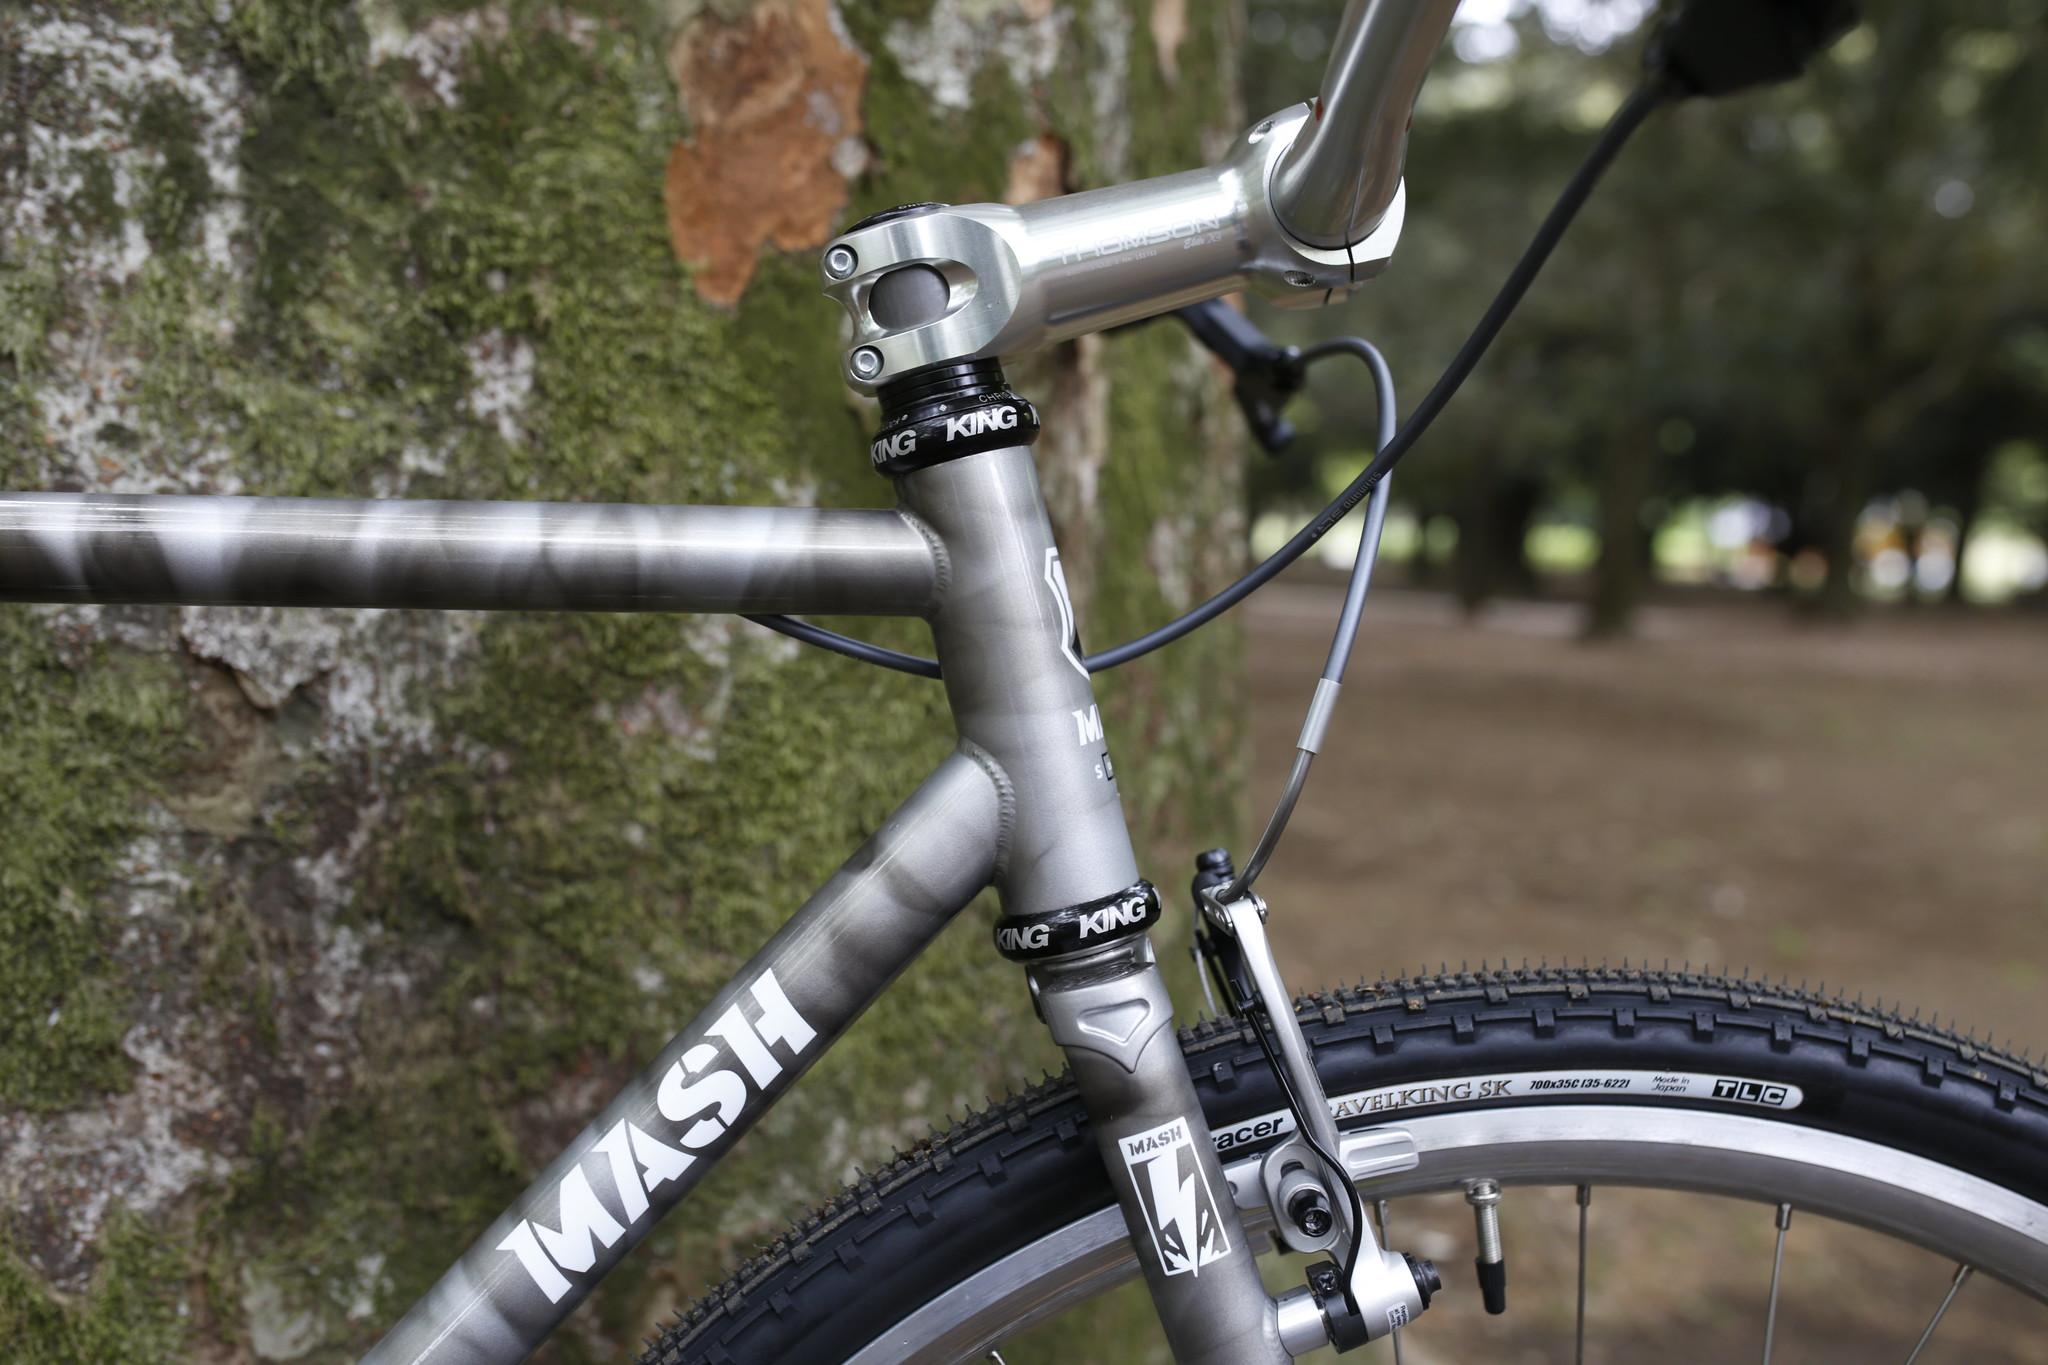 *MASH* steel (M)